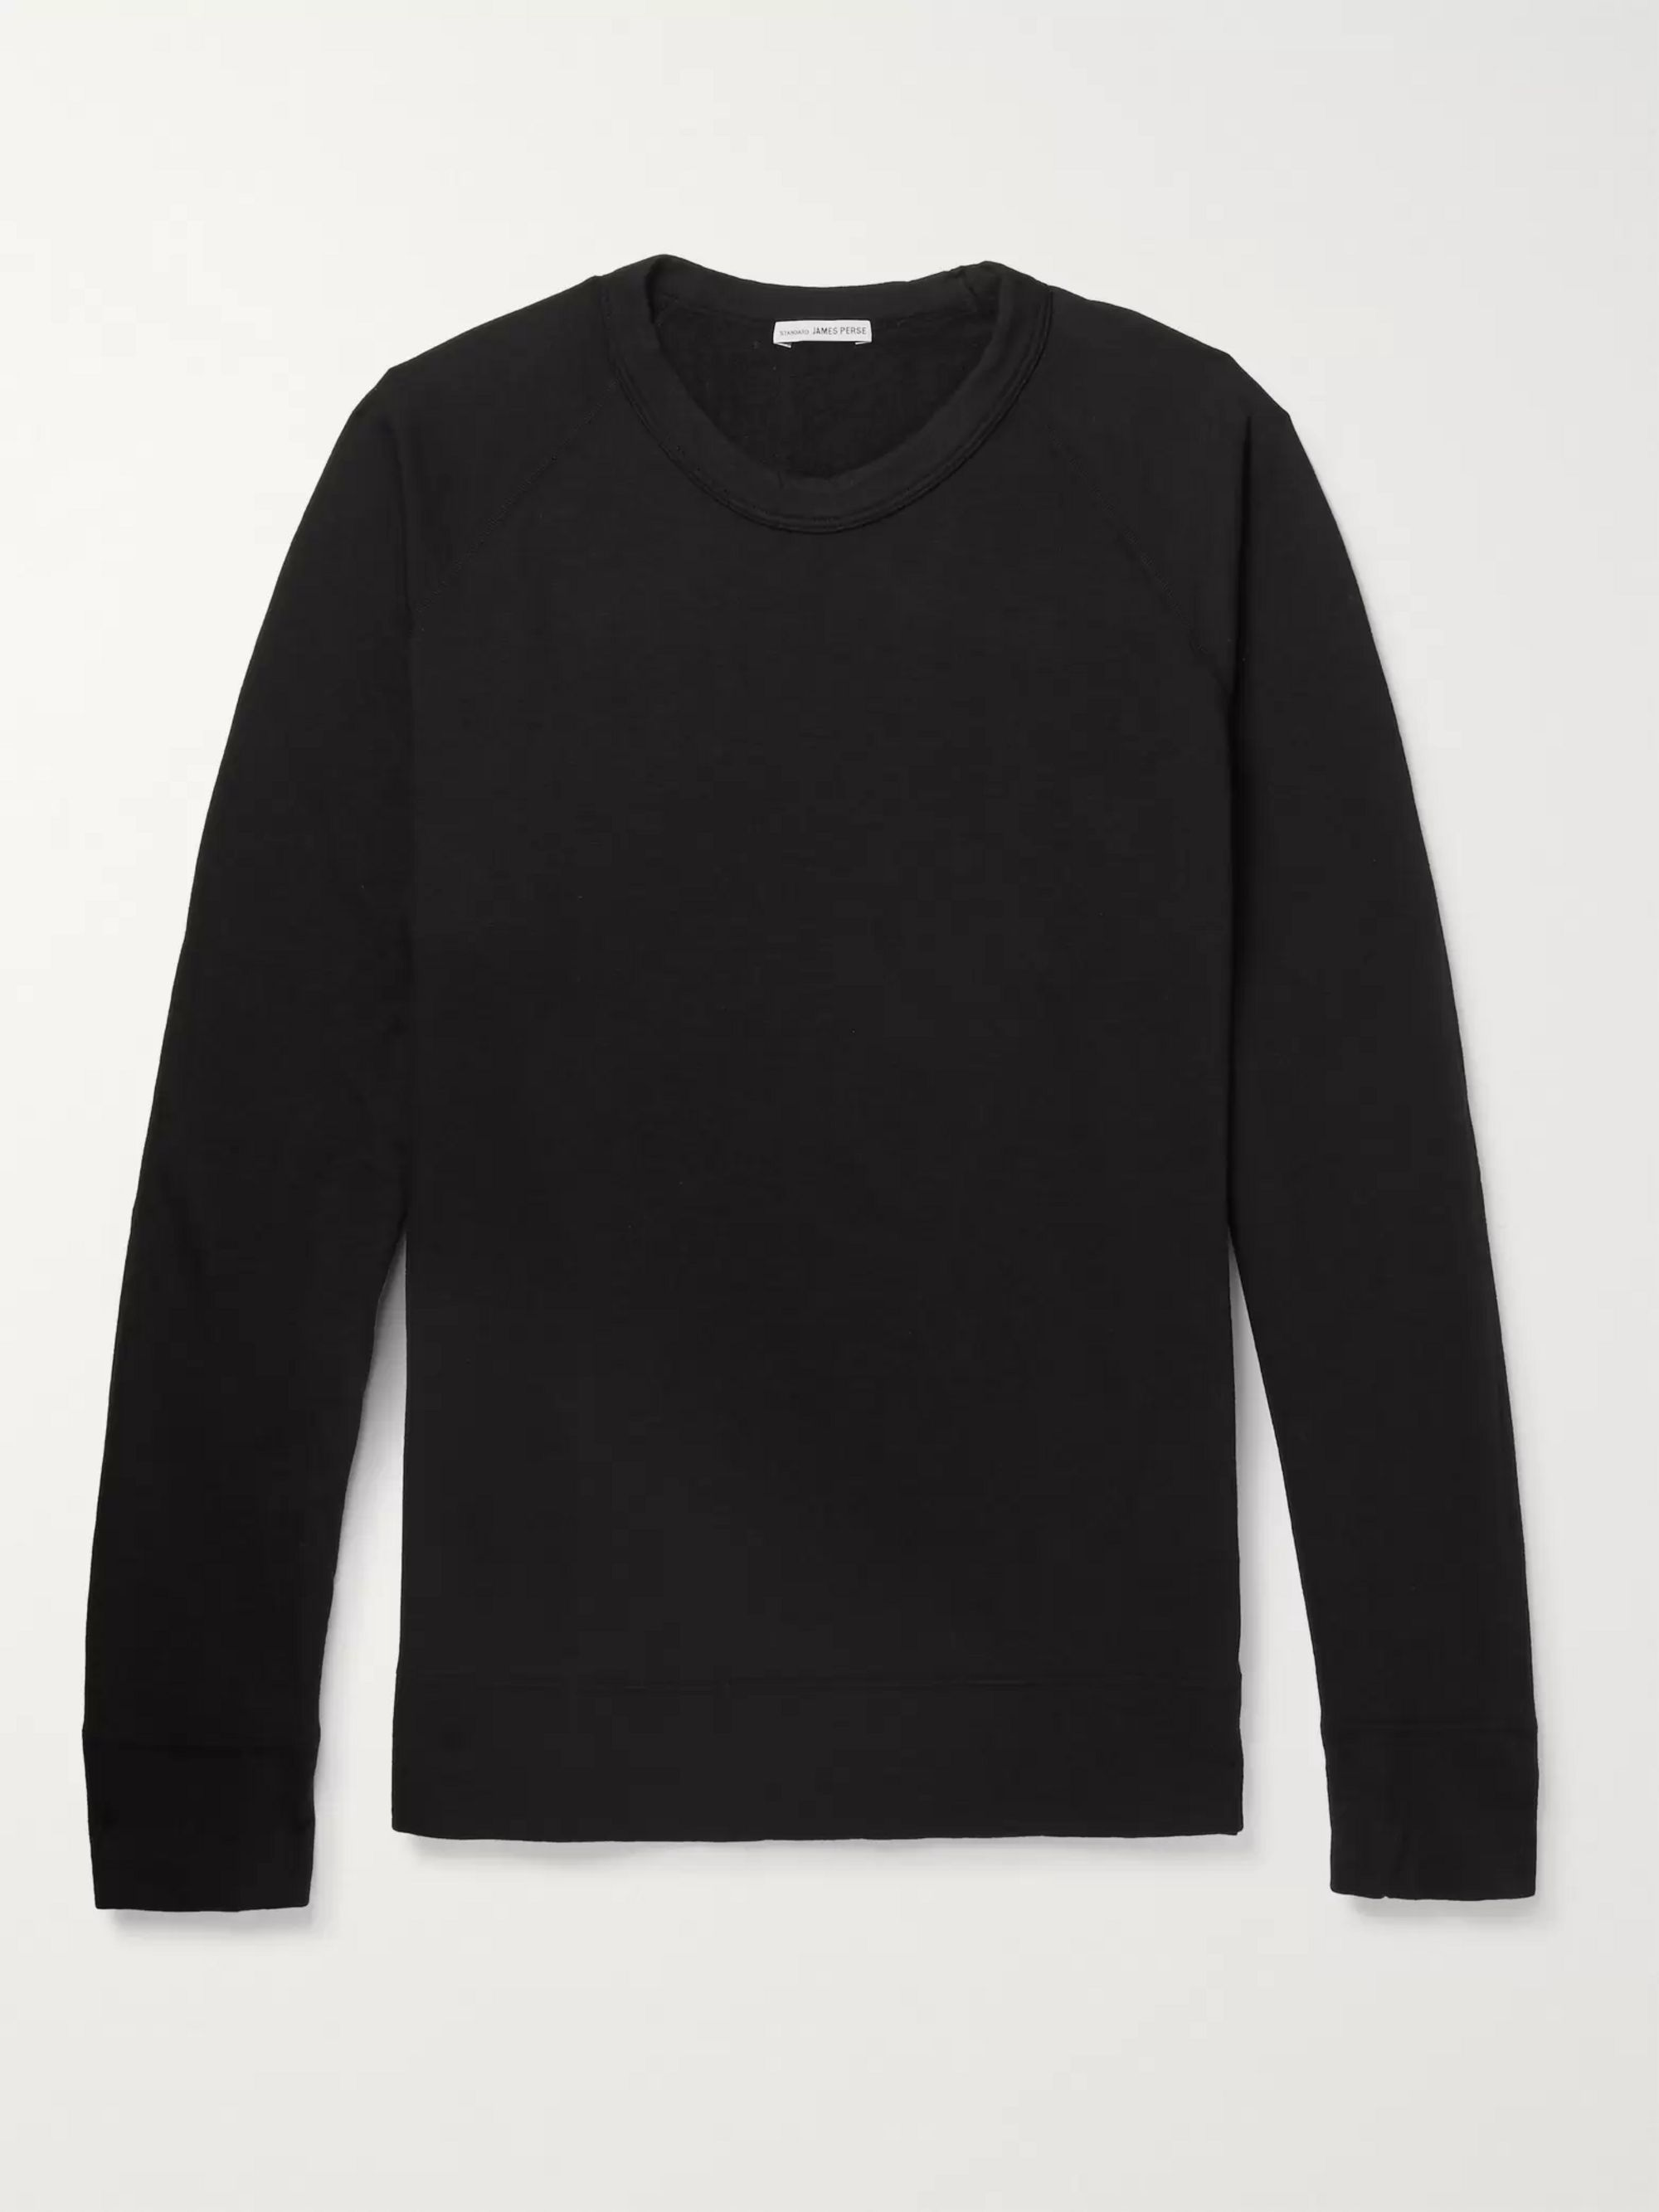 Loopback Supima Cotton Jersey Sweatshirt